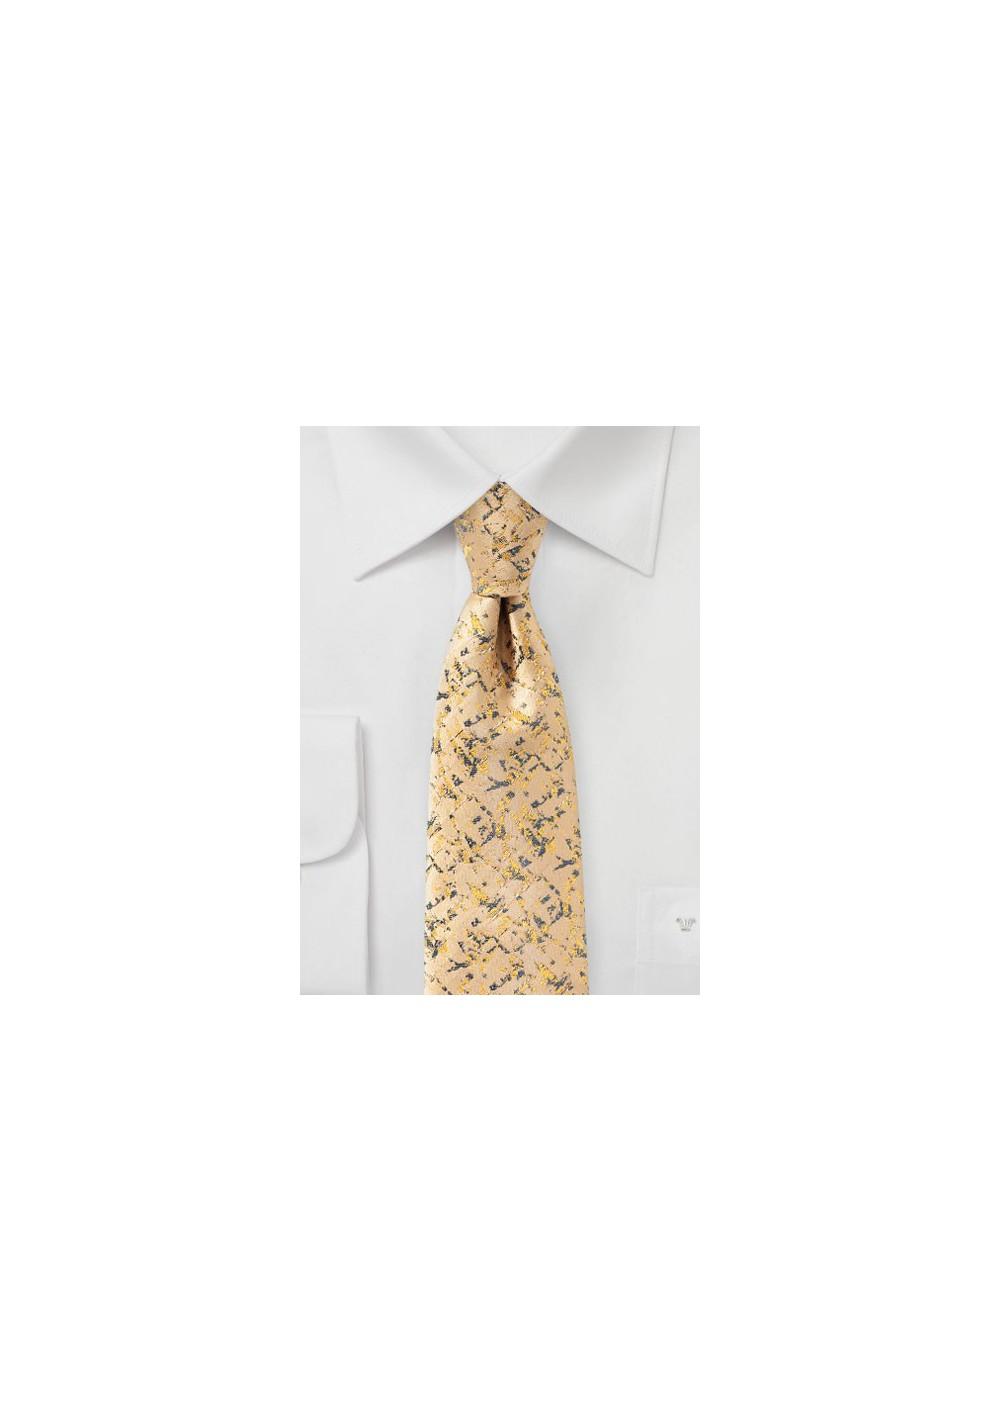 Golden Yellow and Gray Designer Tie